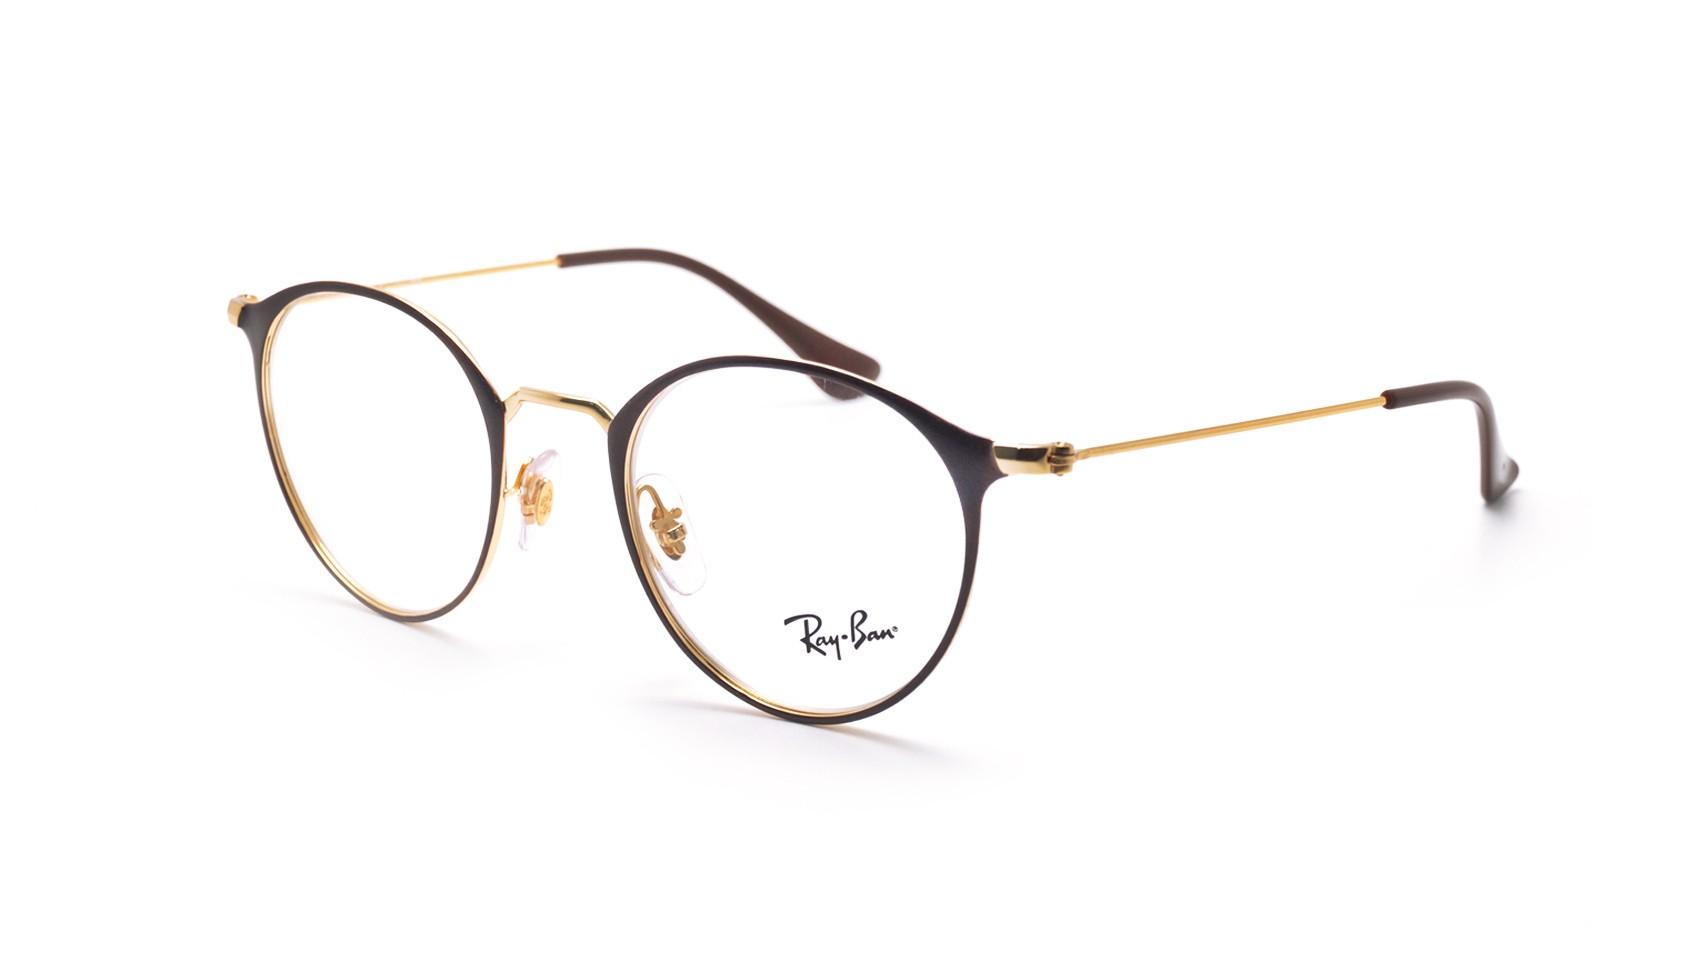 fc2ea771e0 Eyeglasses Ray-Ban RX6378 RB6378 2905 47-21 Brown Small